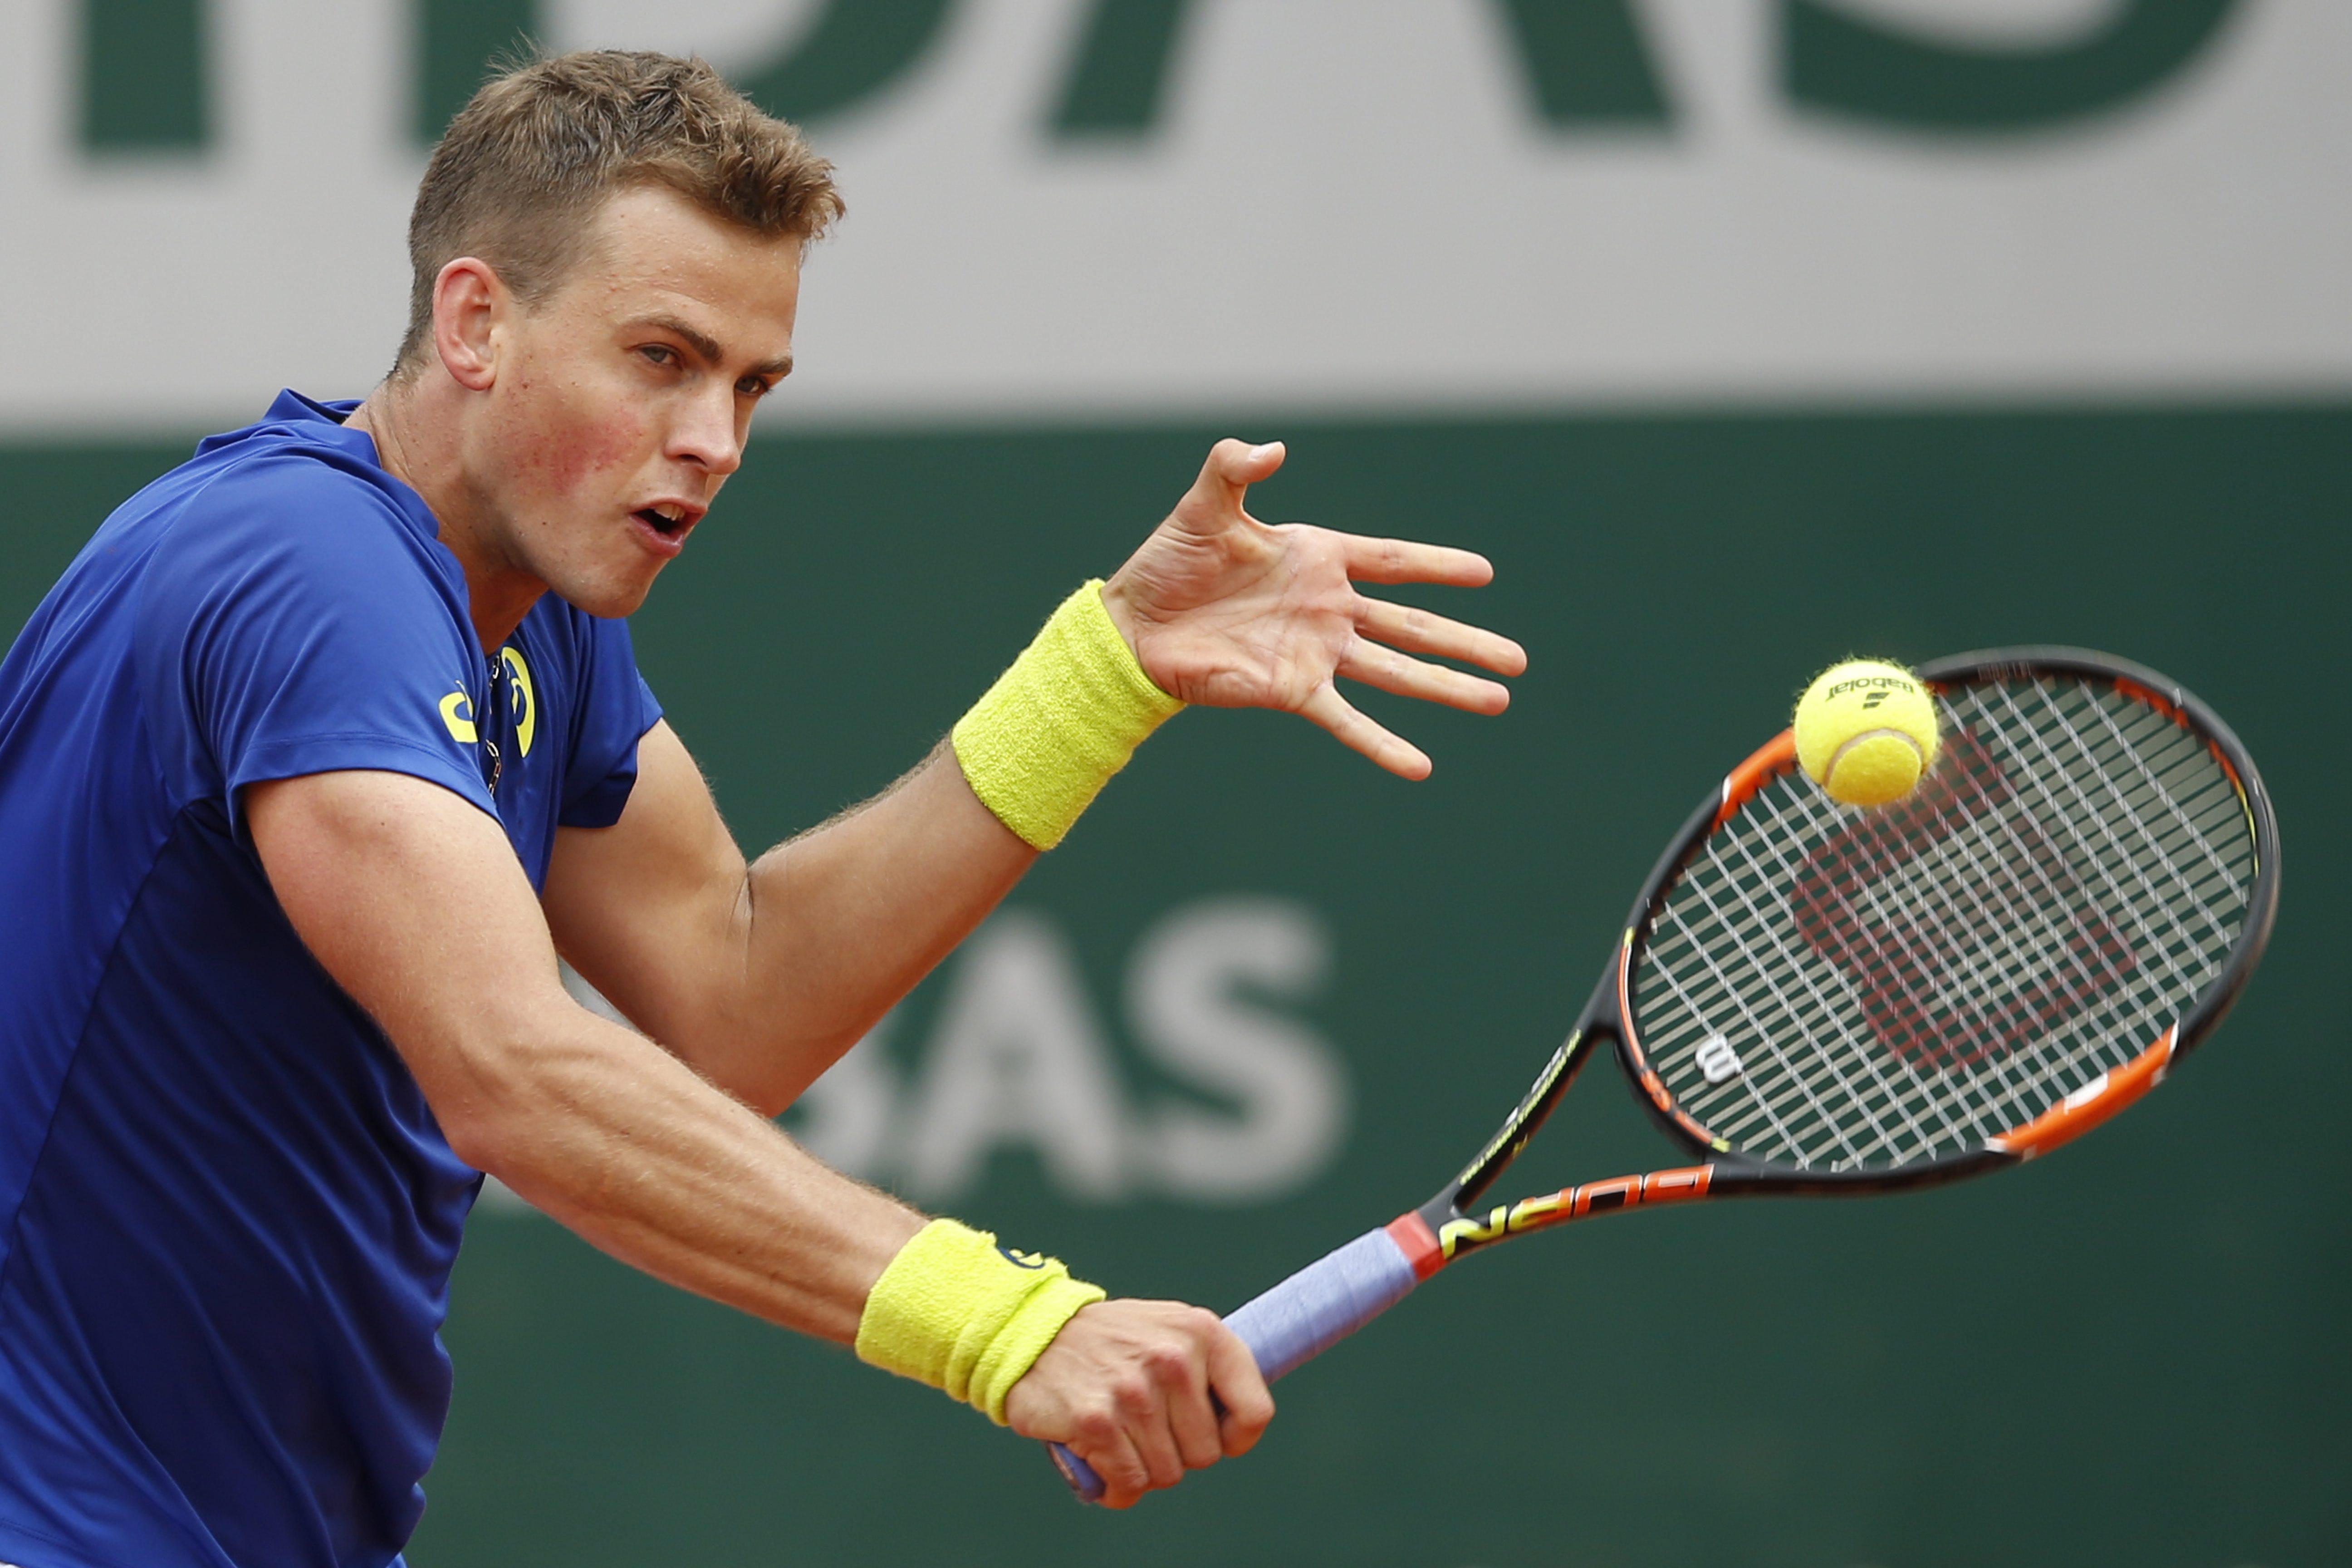 Vasek Pospisil à Roland-Garros le 26 mai 2016. (AP Photo/Alastair Grant)